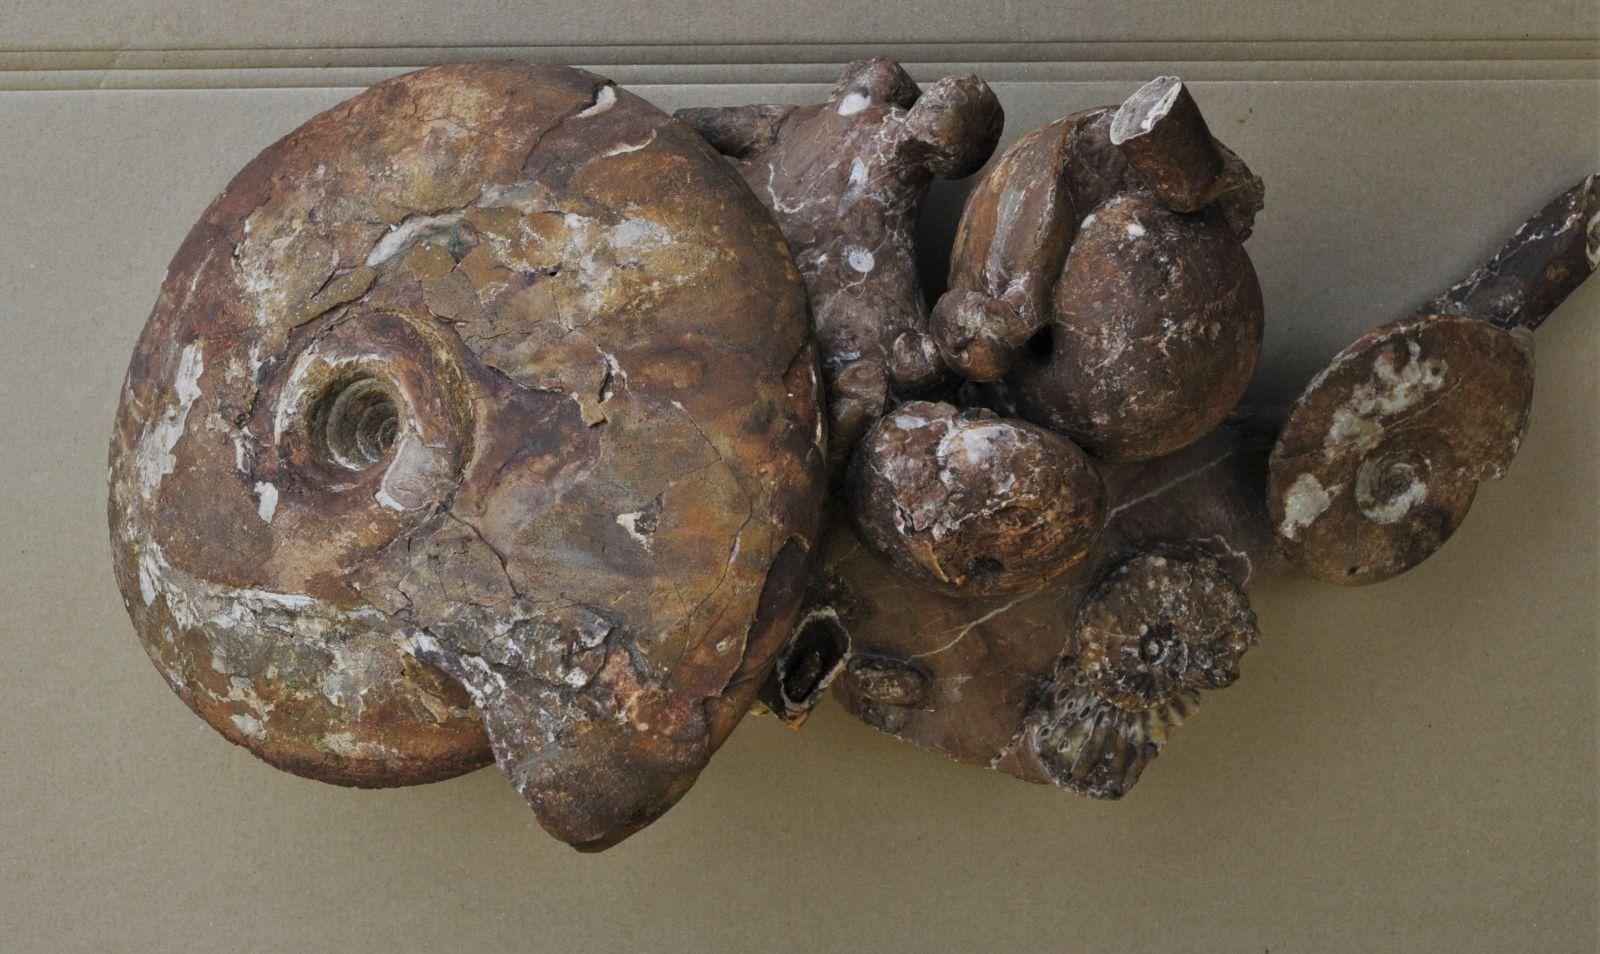 Ptychites Sp. 30cm, Arcestes Cf. omboni